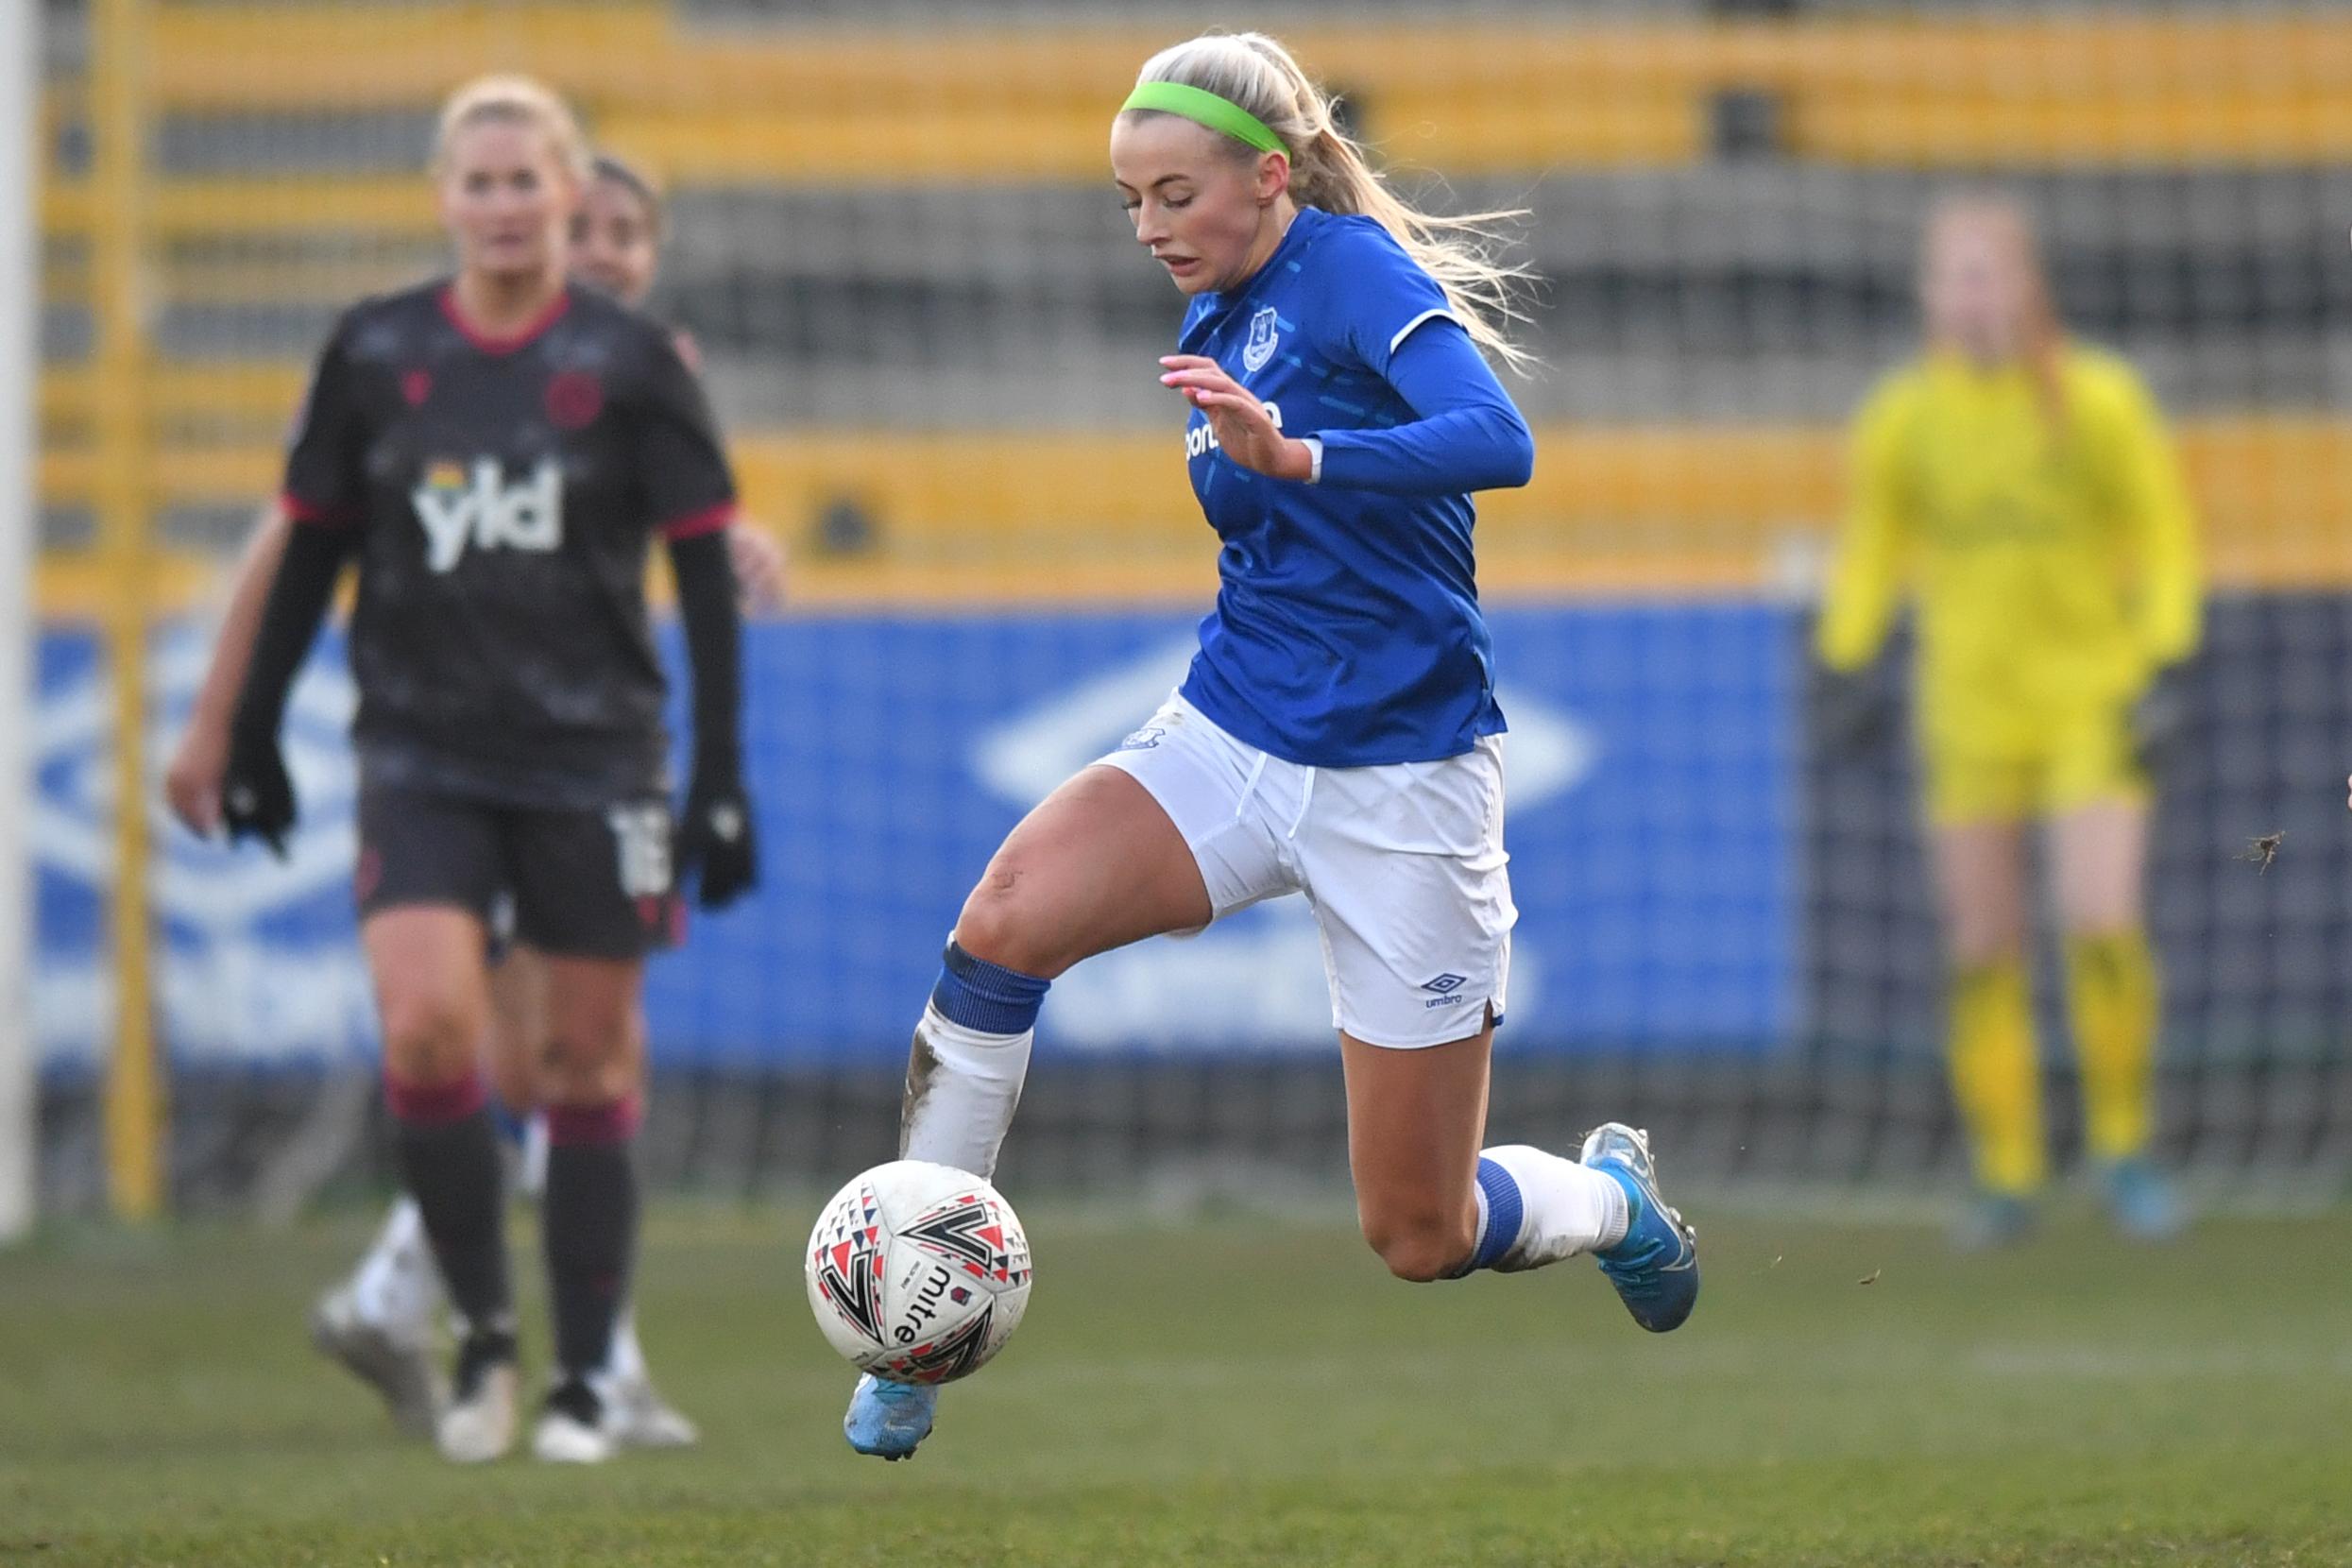 Everton v Reading - FA Women's Super League - Haig Avenue